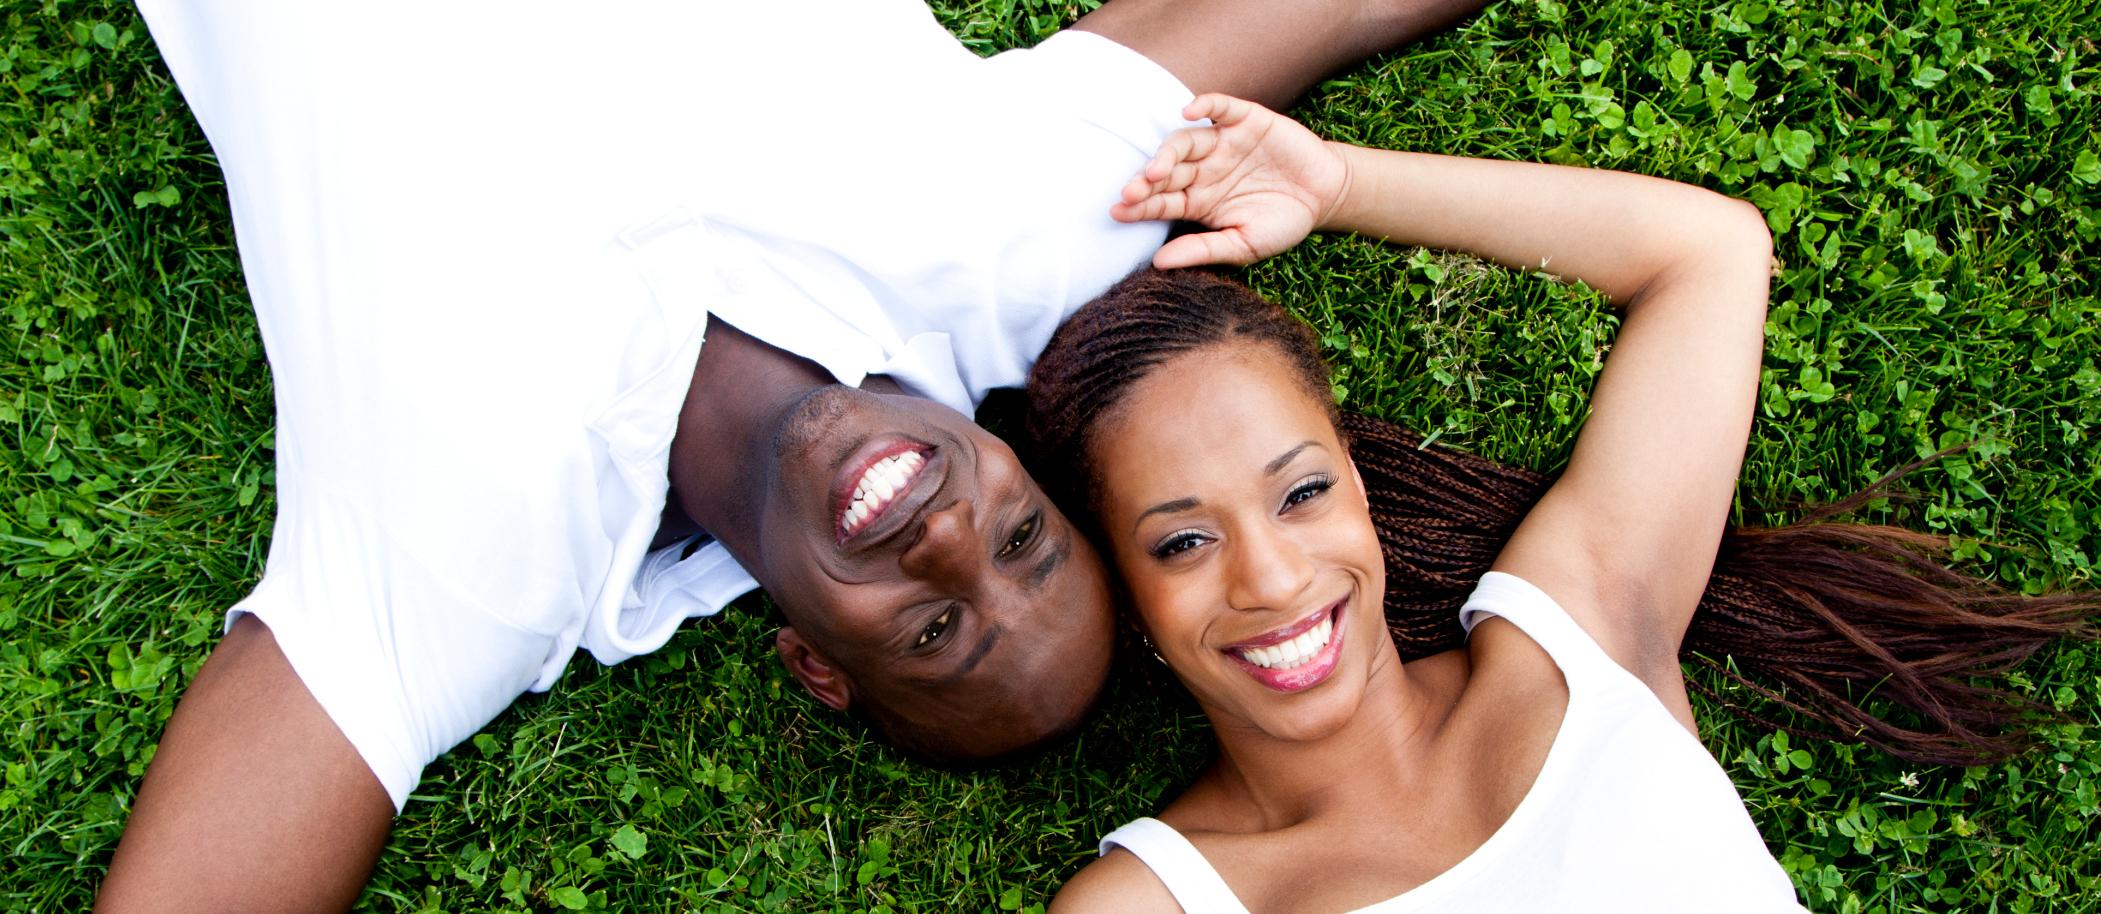 Legaturi riscante ep 44 online dating